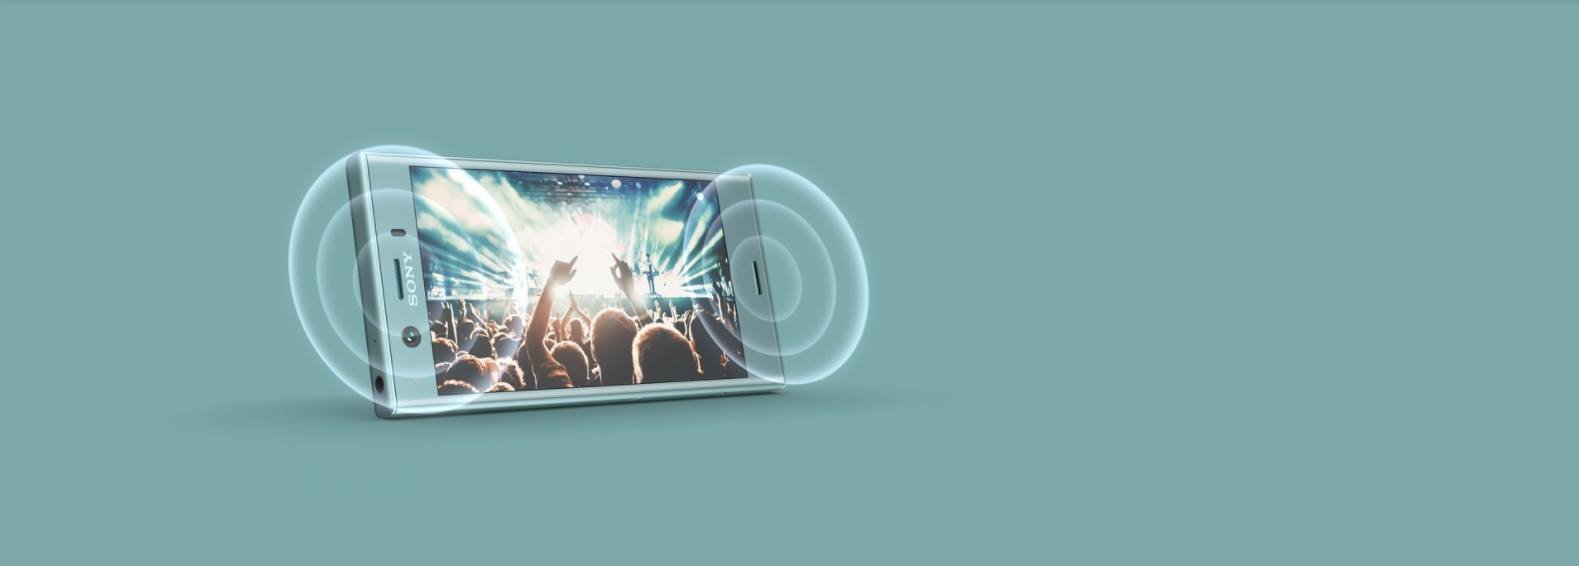 Sony Xperia XZ1 Compact (7)